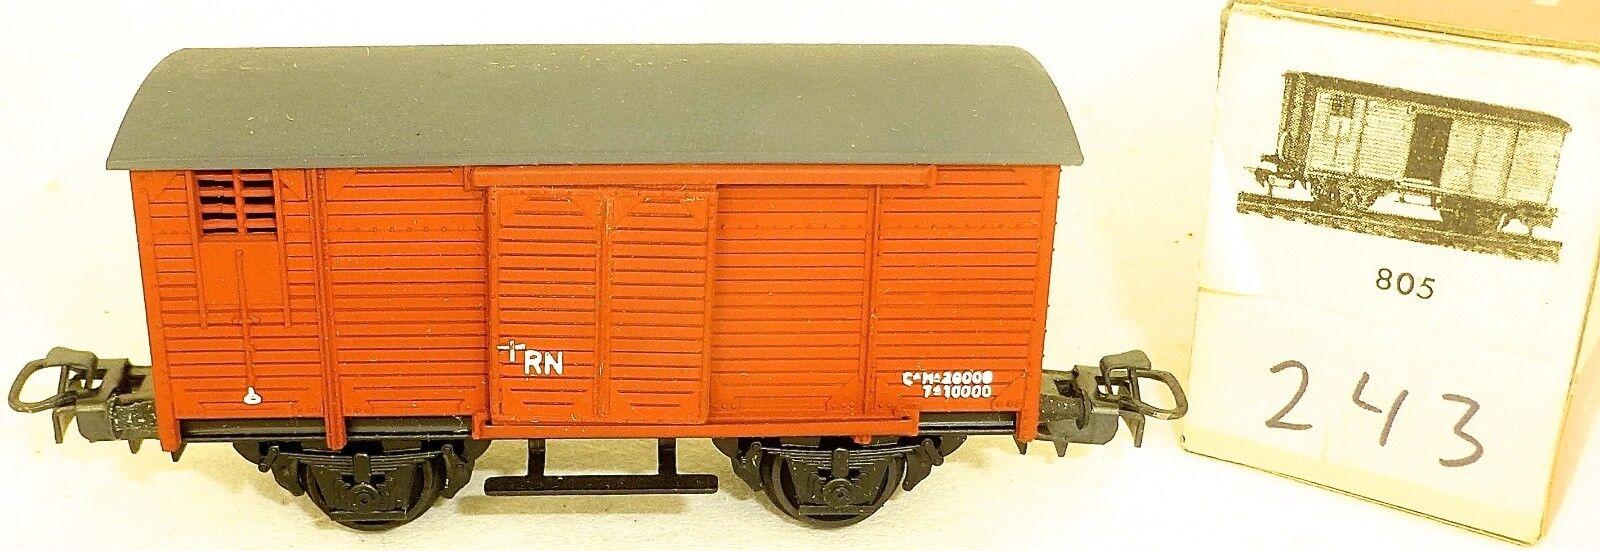 Rn Freight Car Closed electredren 805 243 h0 1 87 EMB. orig å